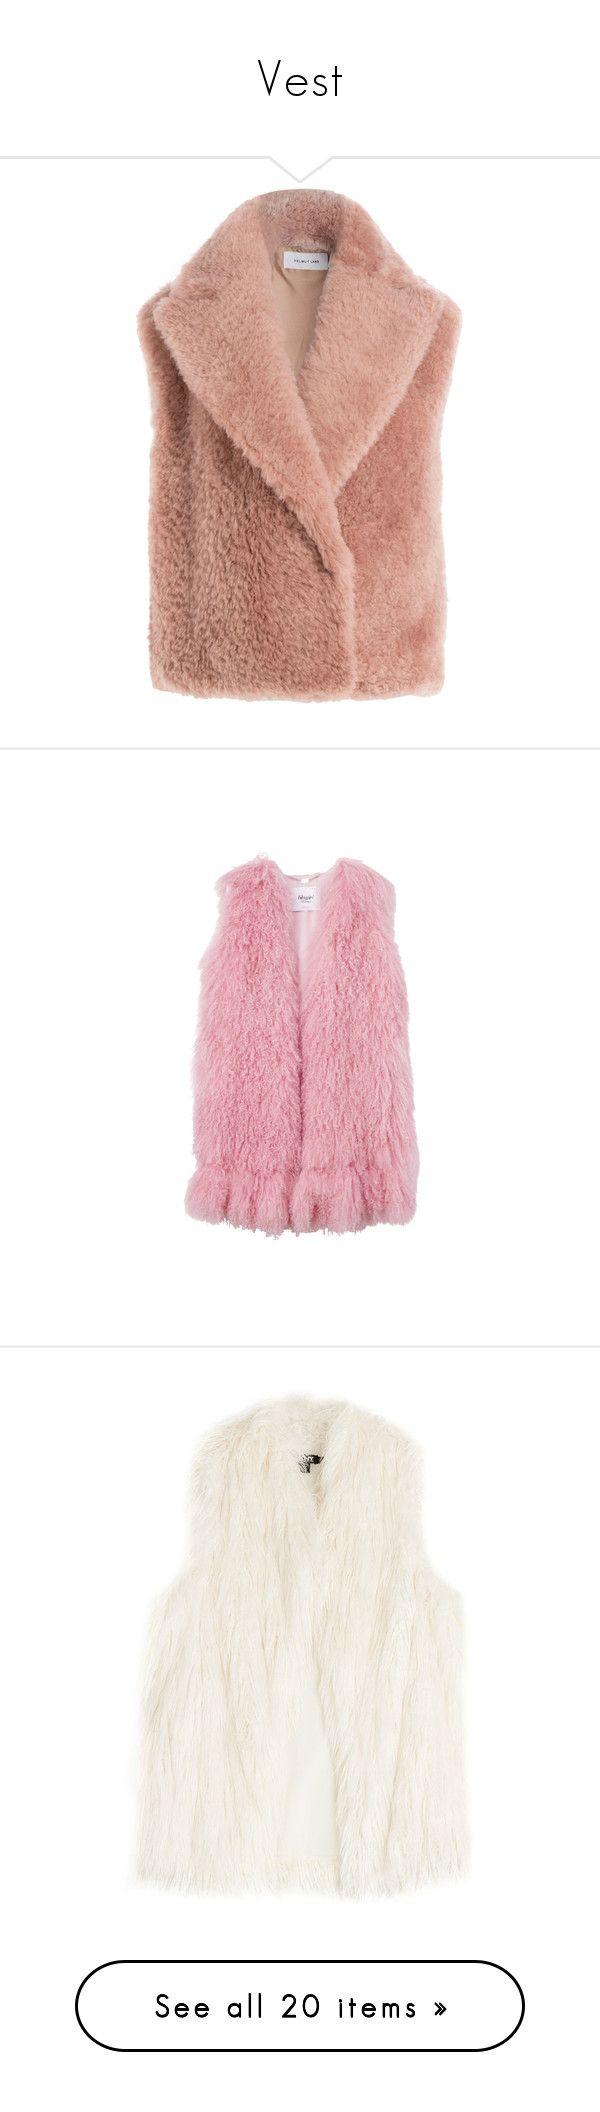 """Vest"" by yourgoldlord ❤ liked on Polyvore featuring outerwear, vests, jackets, rose, slim vest, sheep fur vest, shearling vest, helmut lang, fuzzy vest and fur"